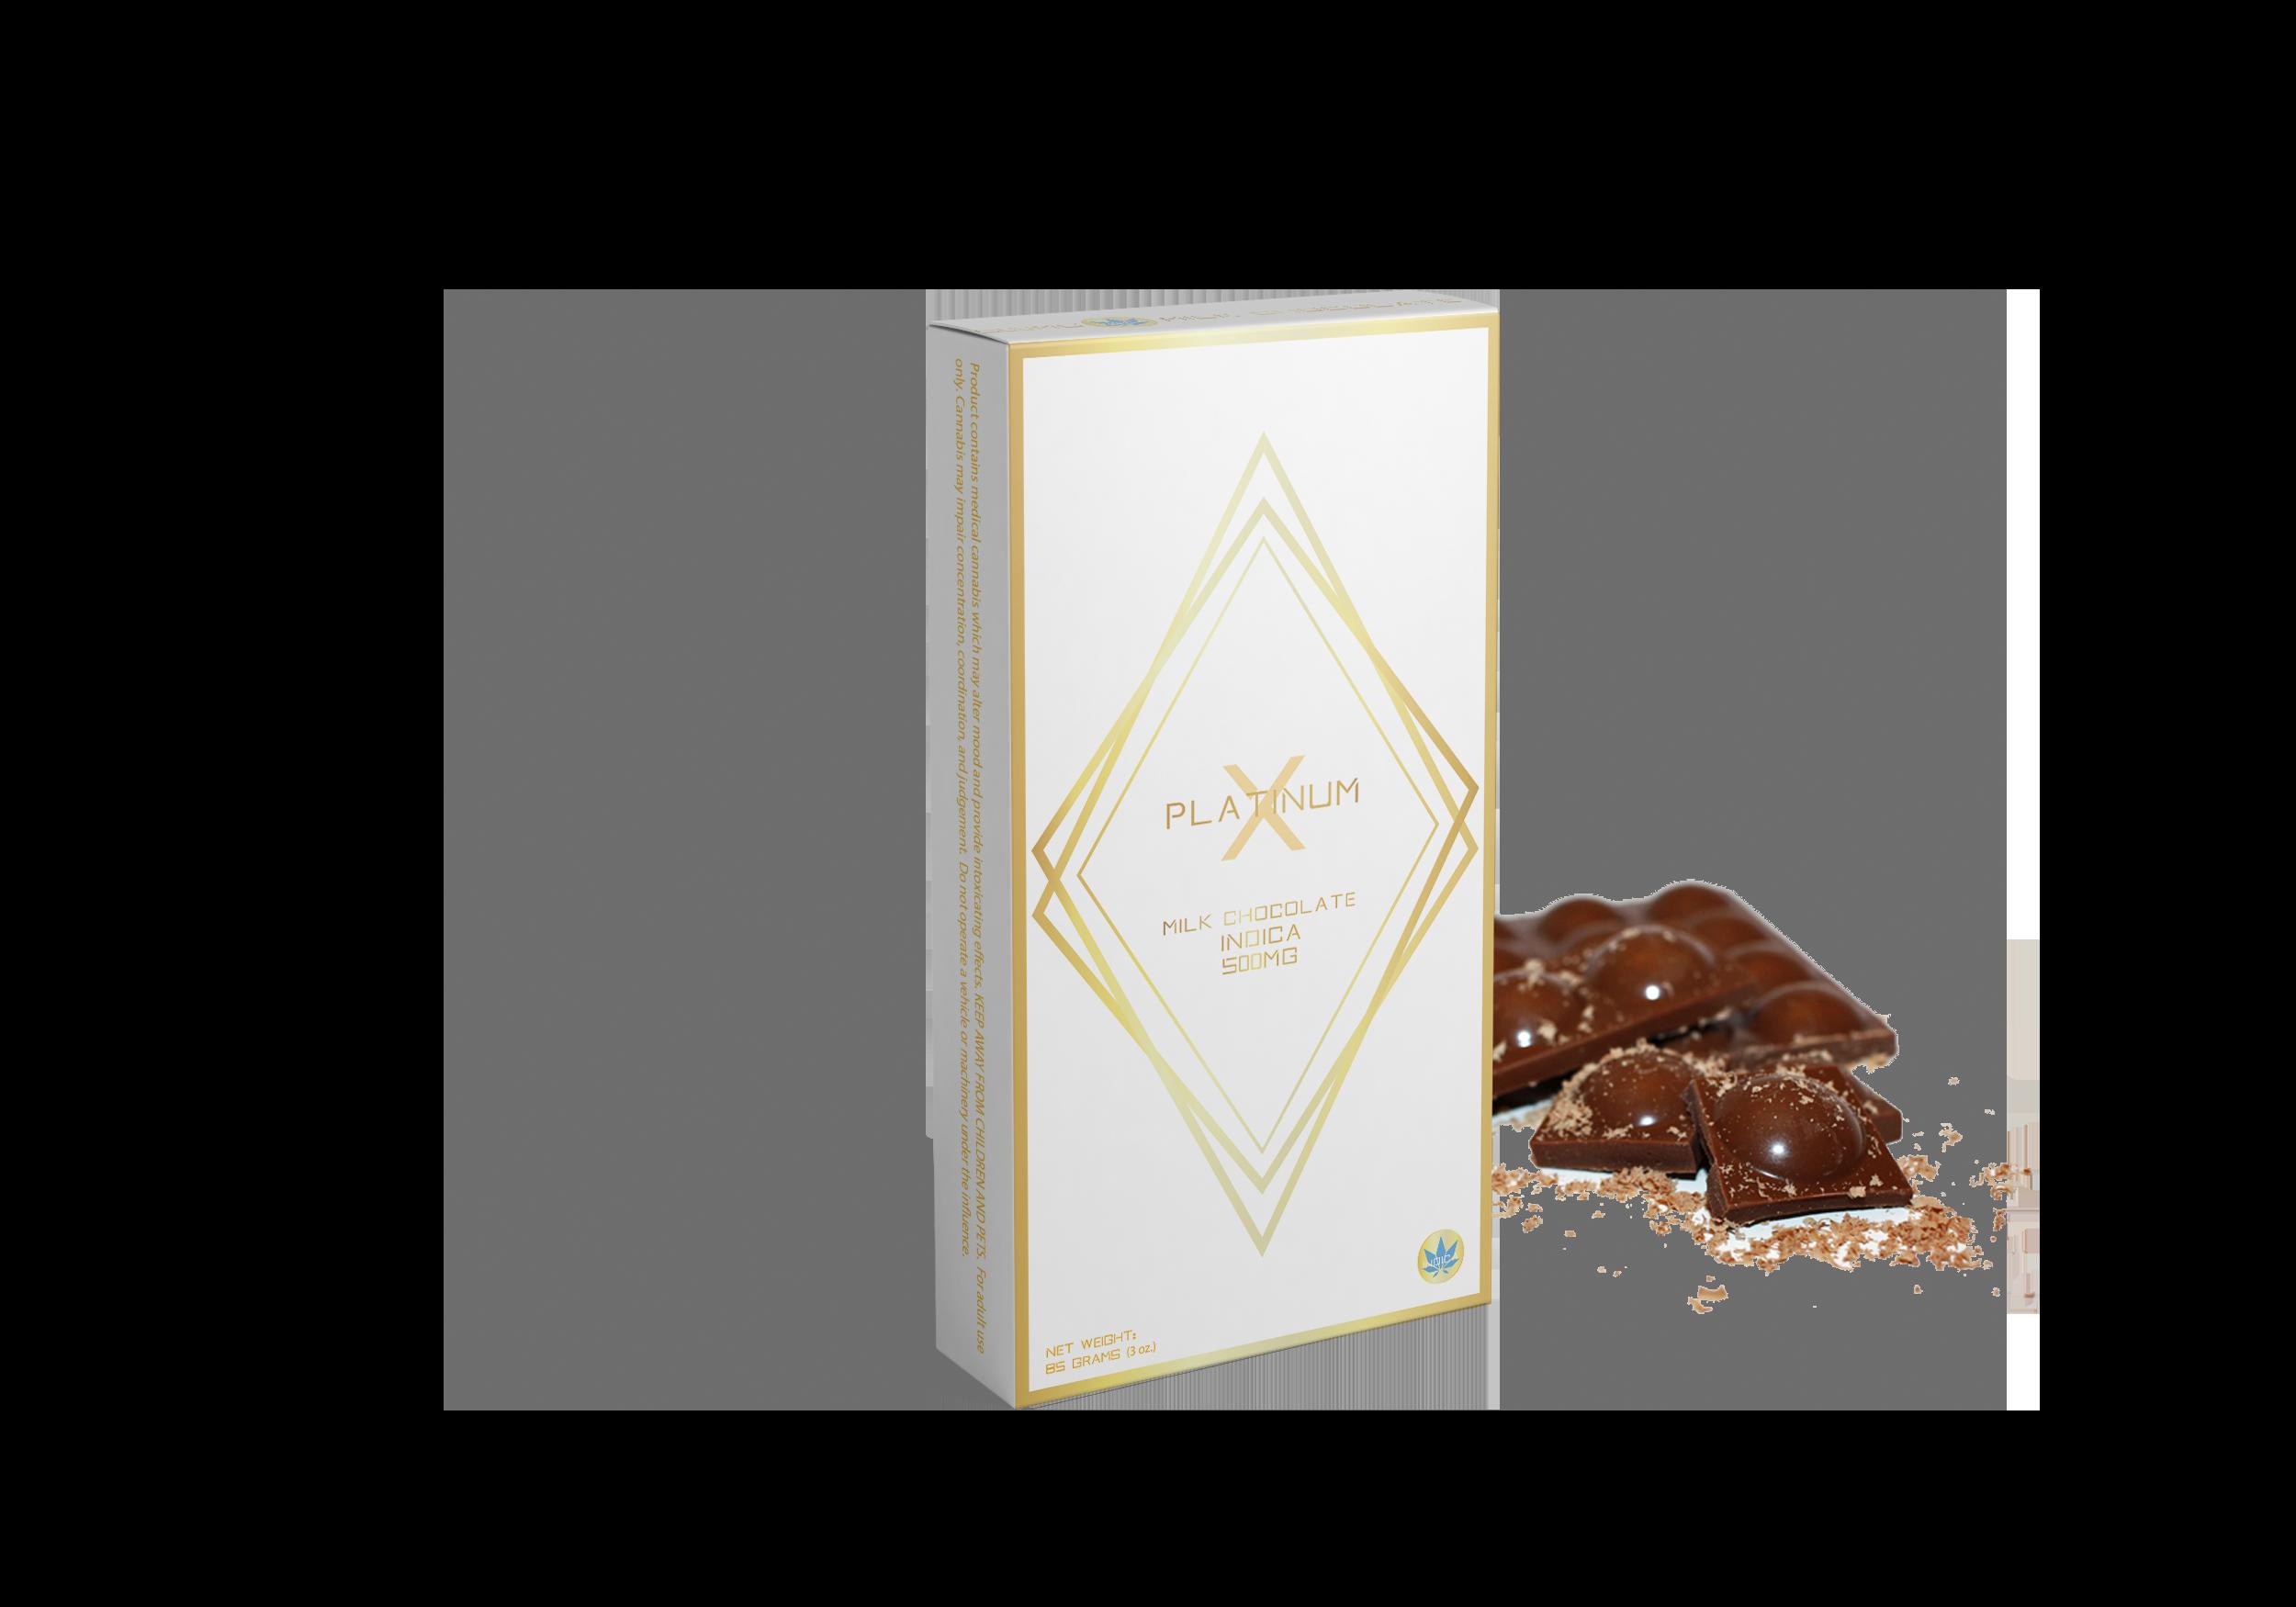 MILK CHOCOLATE 500MG INDICA- PlatinumX